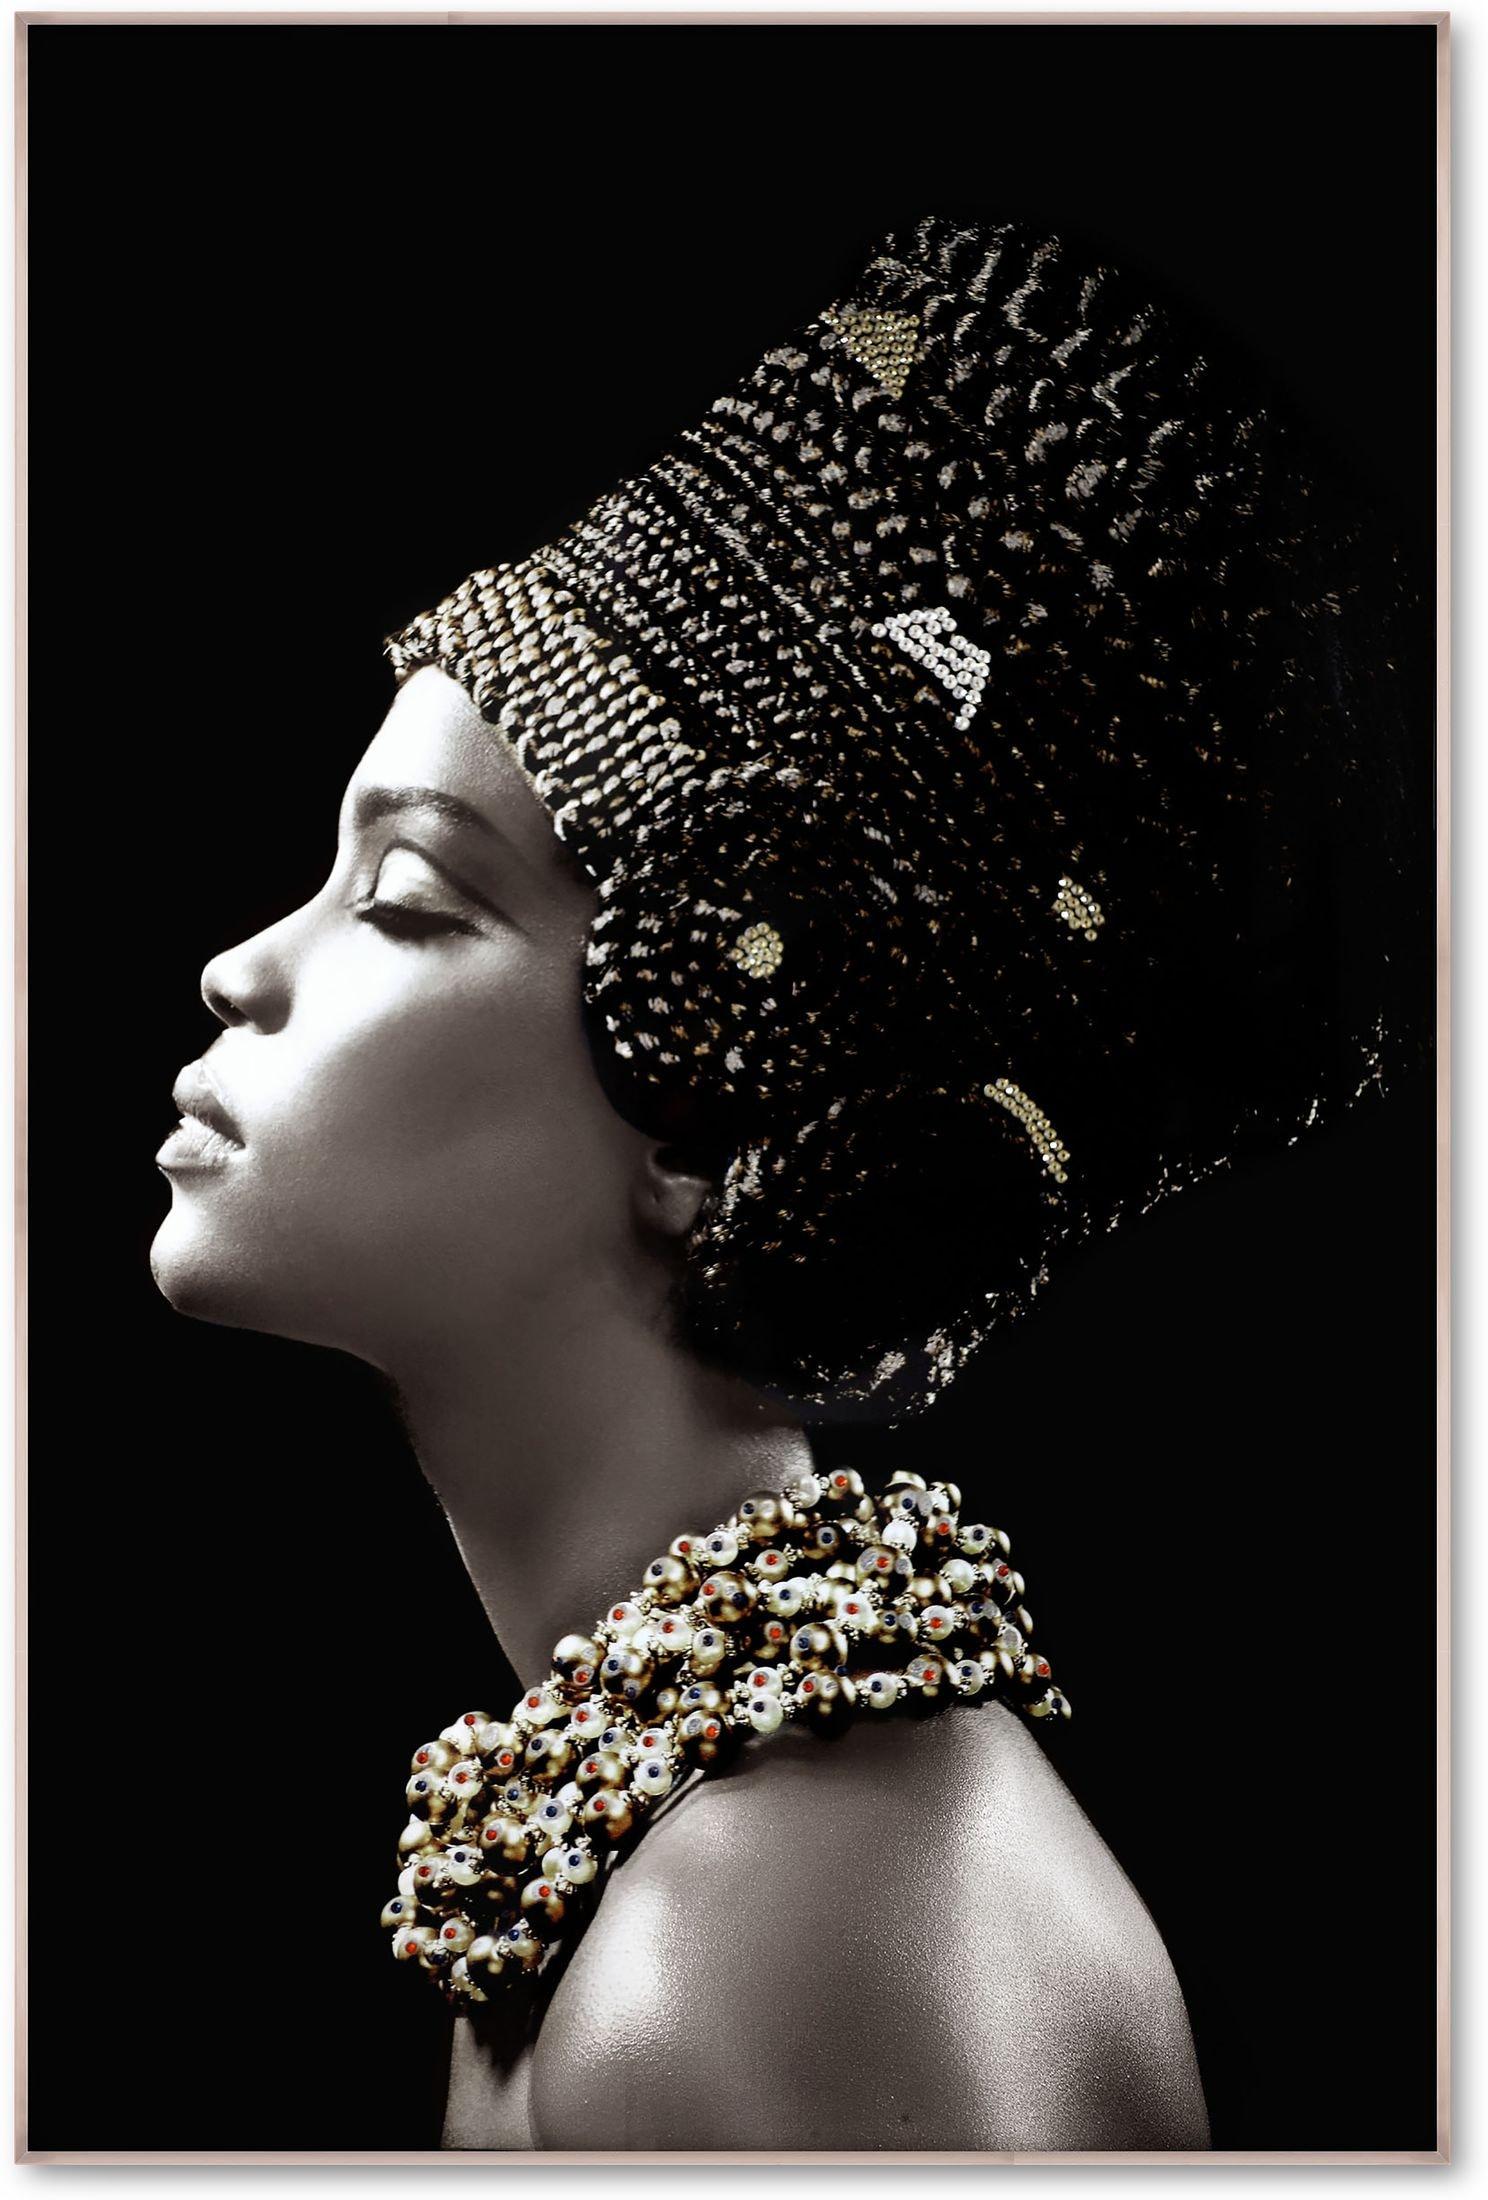 Home Accessories - Embellished Headdress Wall Art